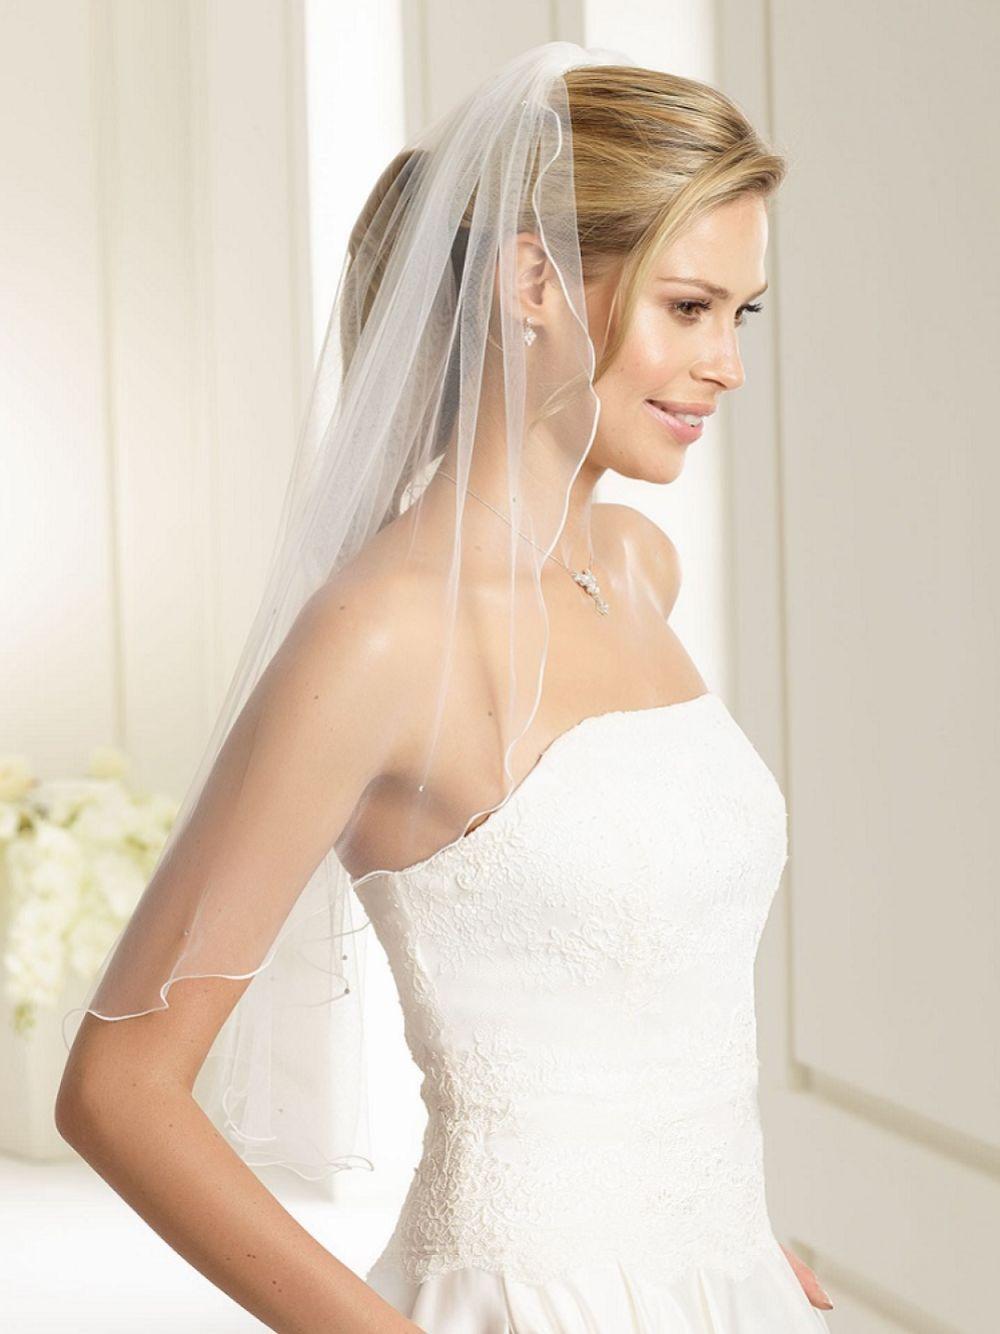 Bianco Ivory Single Tier Swarovski Crystal Elbow Length Veil with Corded Edge S135